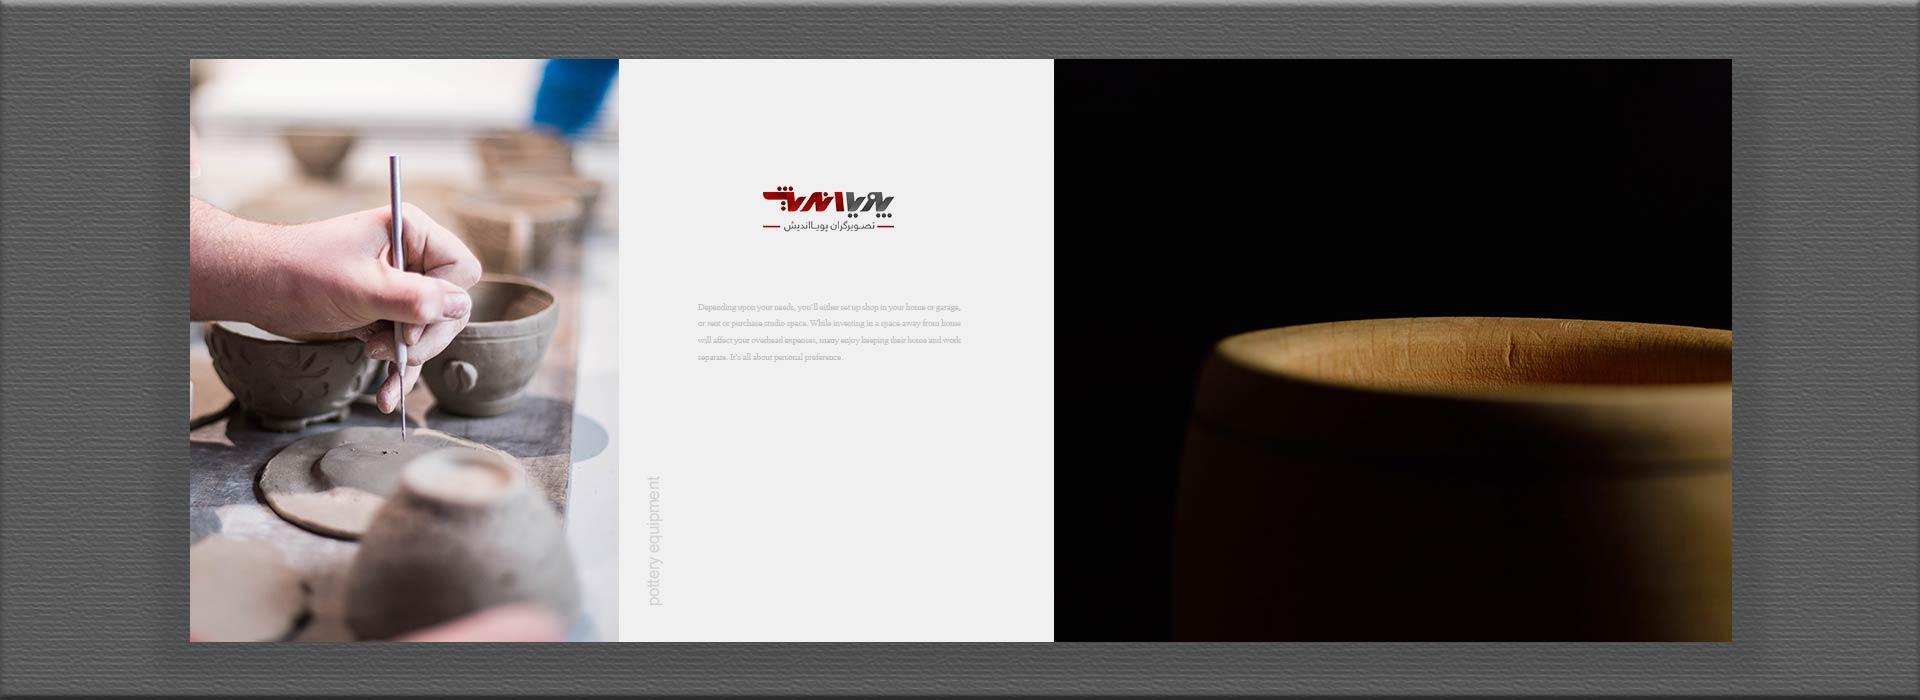 pottery equipment - چگونه کسب و کار سفالگری راه اندازی کنیم ؟